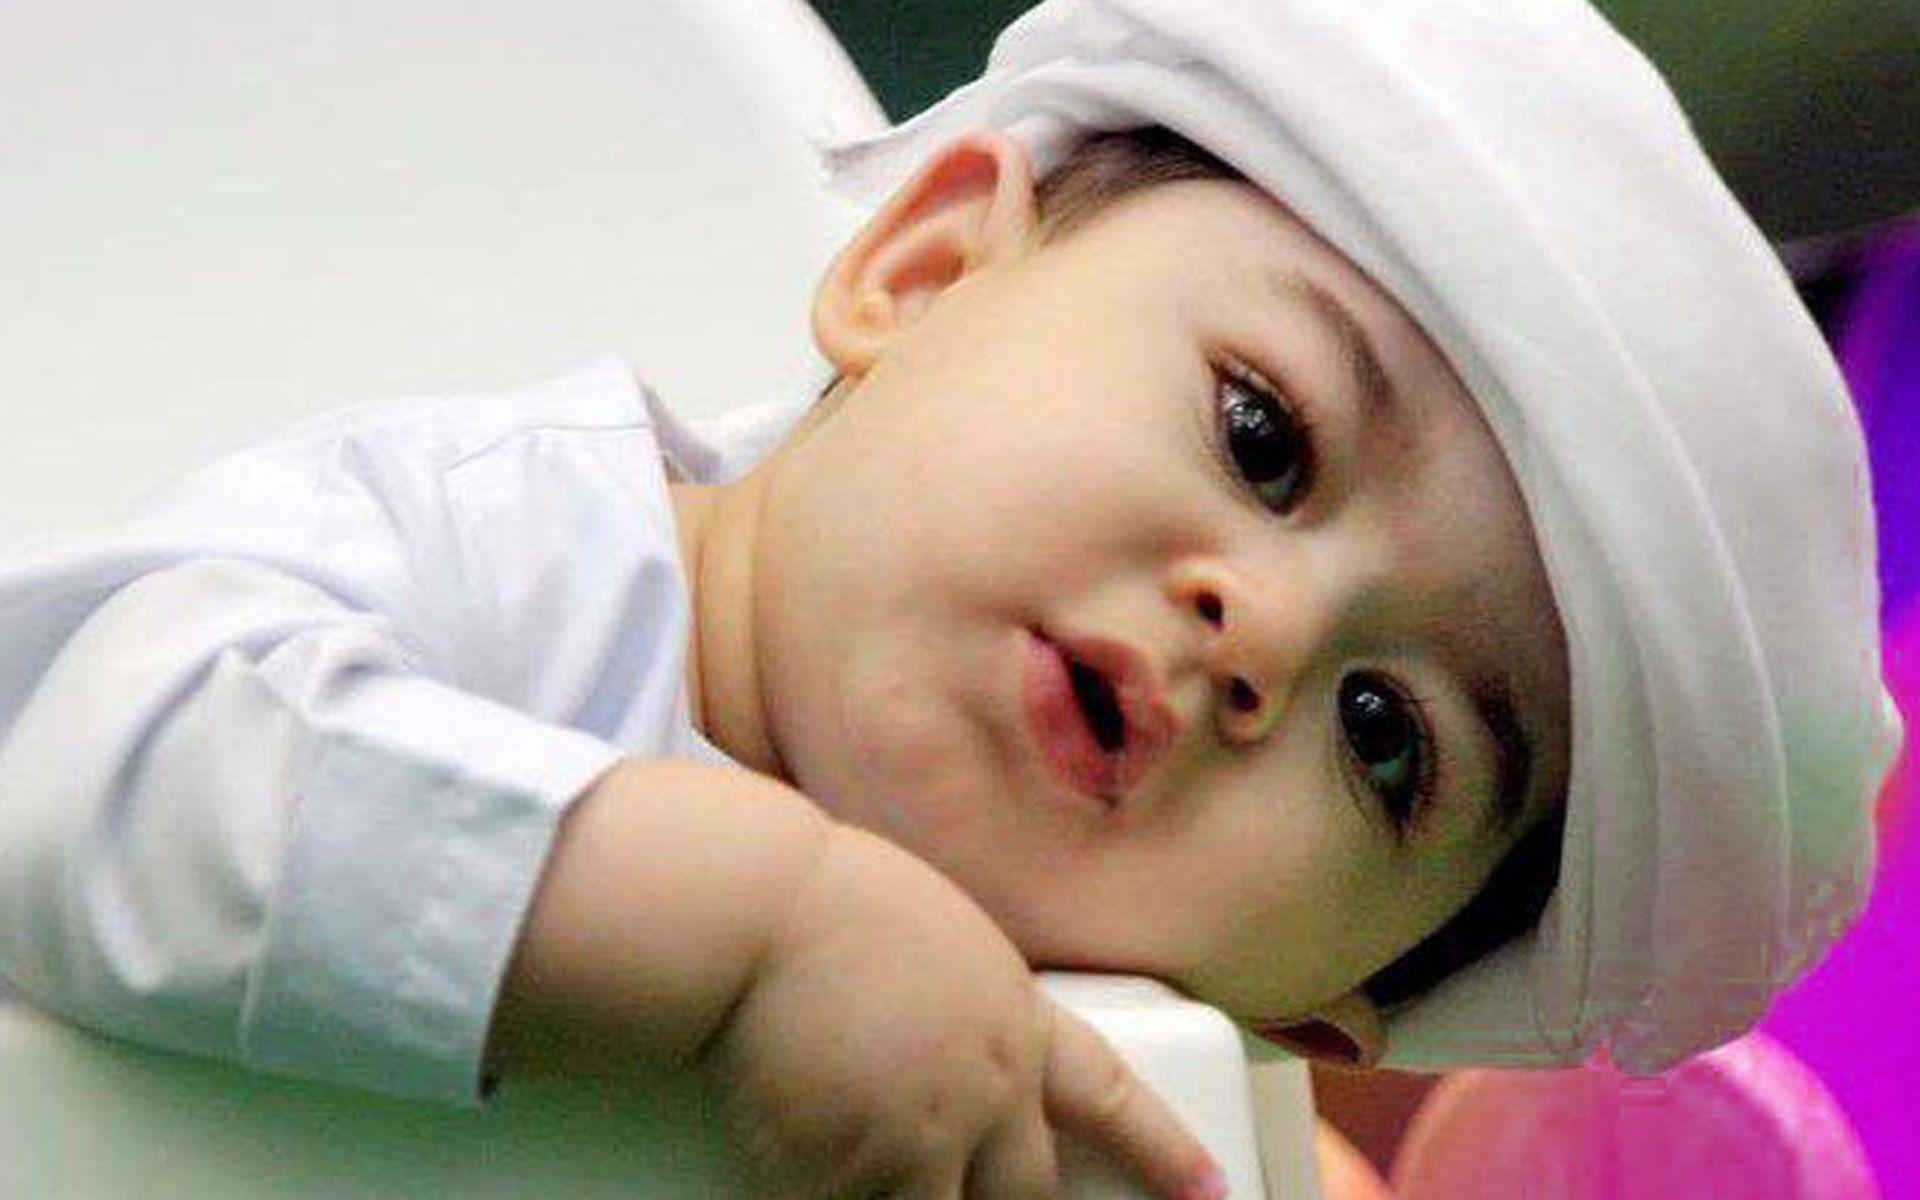 Cute Baby Boy 2 Wallpapers: Cute Boy Wallpaper ·① WallpaperTag